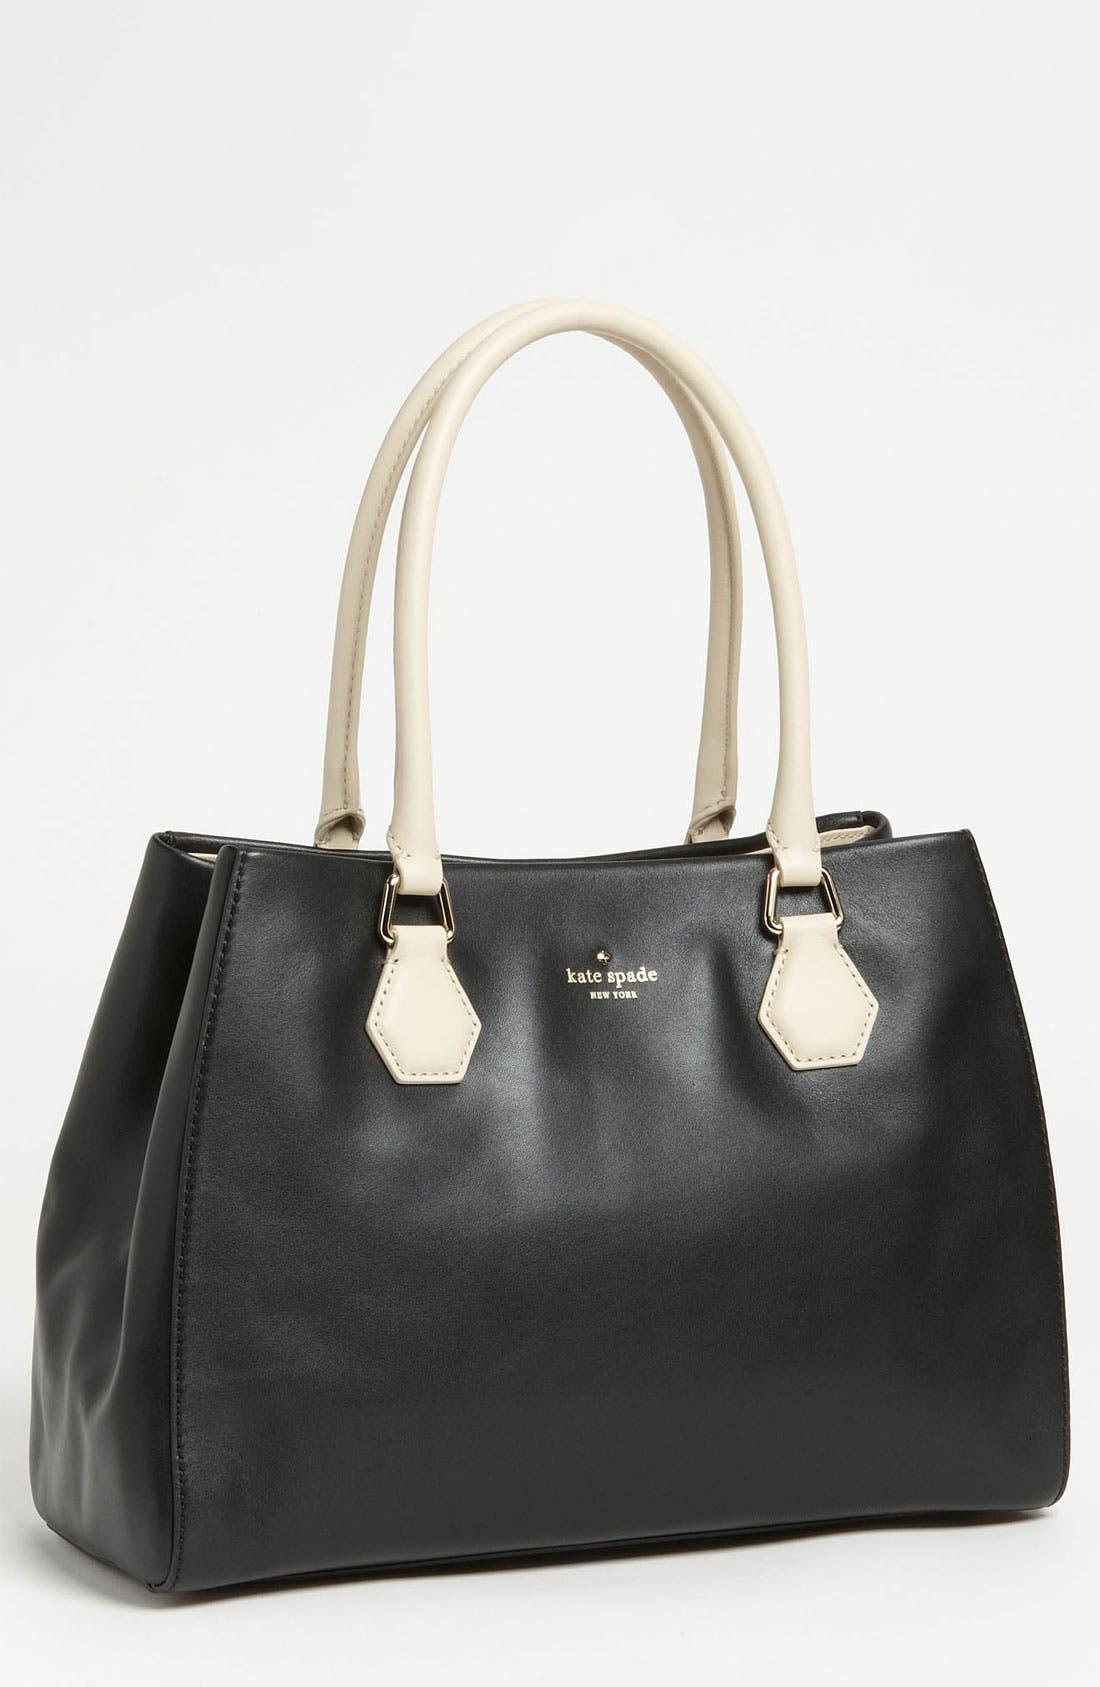 Alternate Image 1 Selected - kate spade new york 'catherine street - louise' shoulder bag